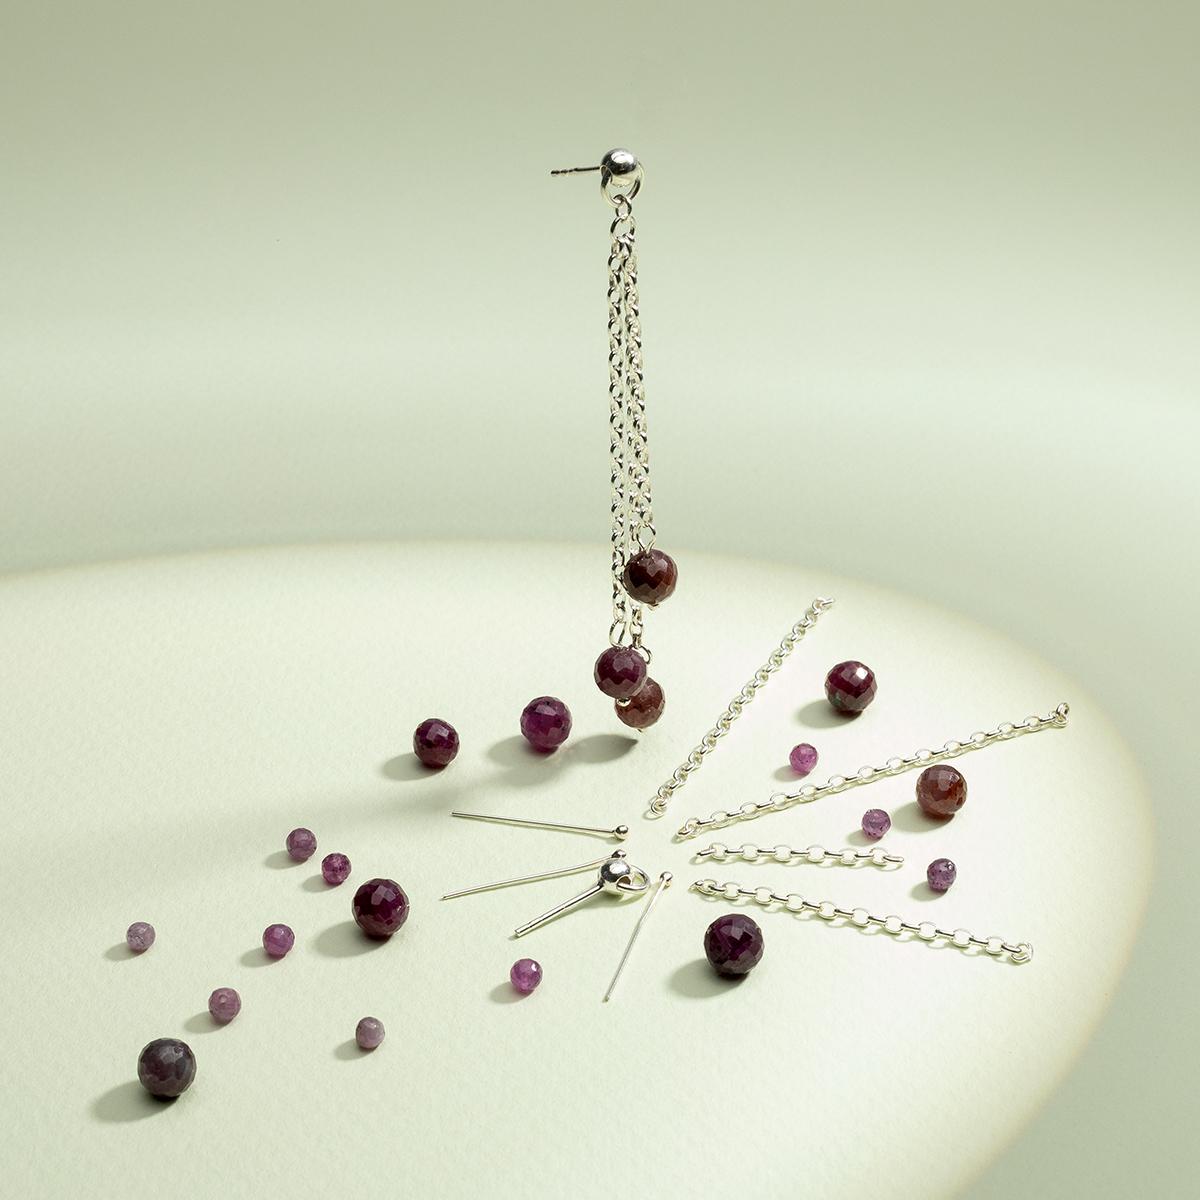 półfabrykaty do biżuterii srebrne